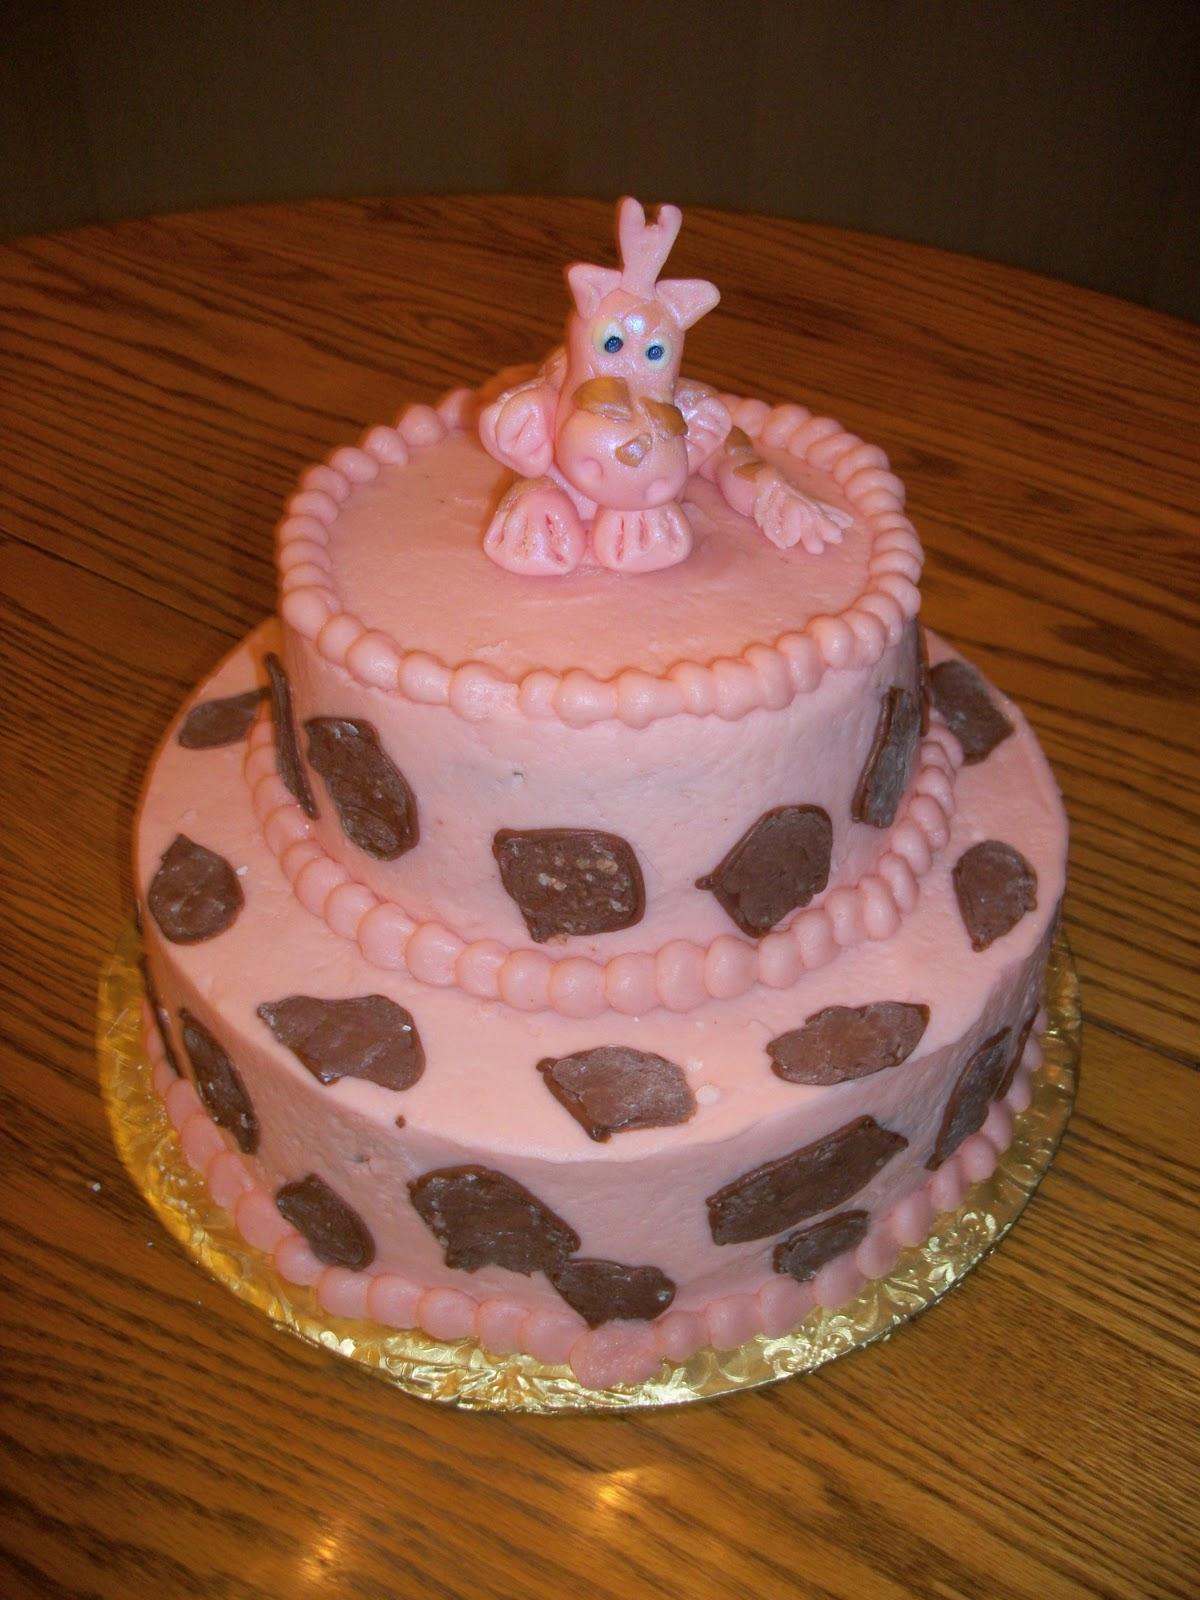 Scratchbaker Pink Giraffe Birthday Cake